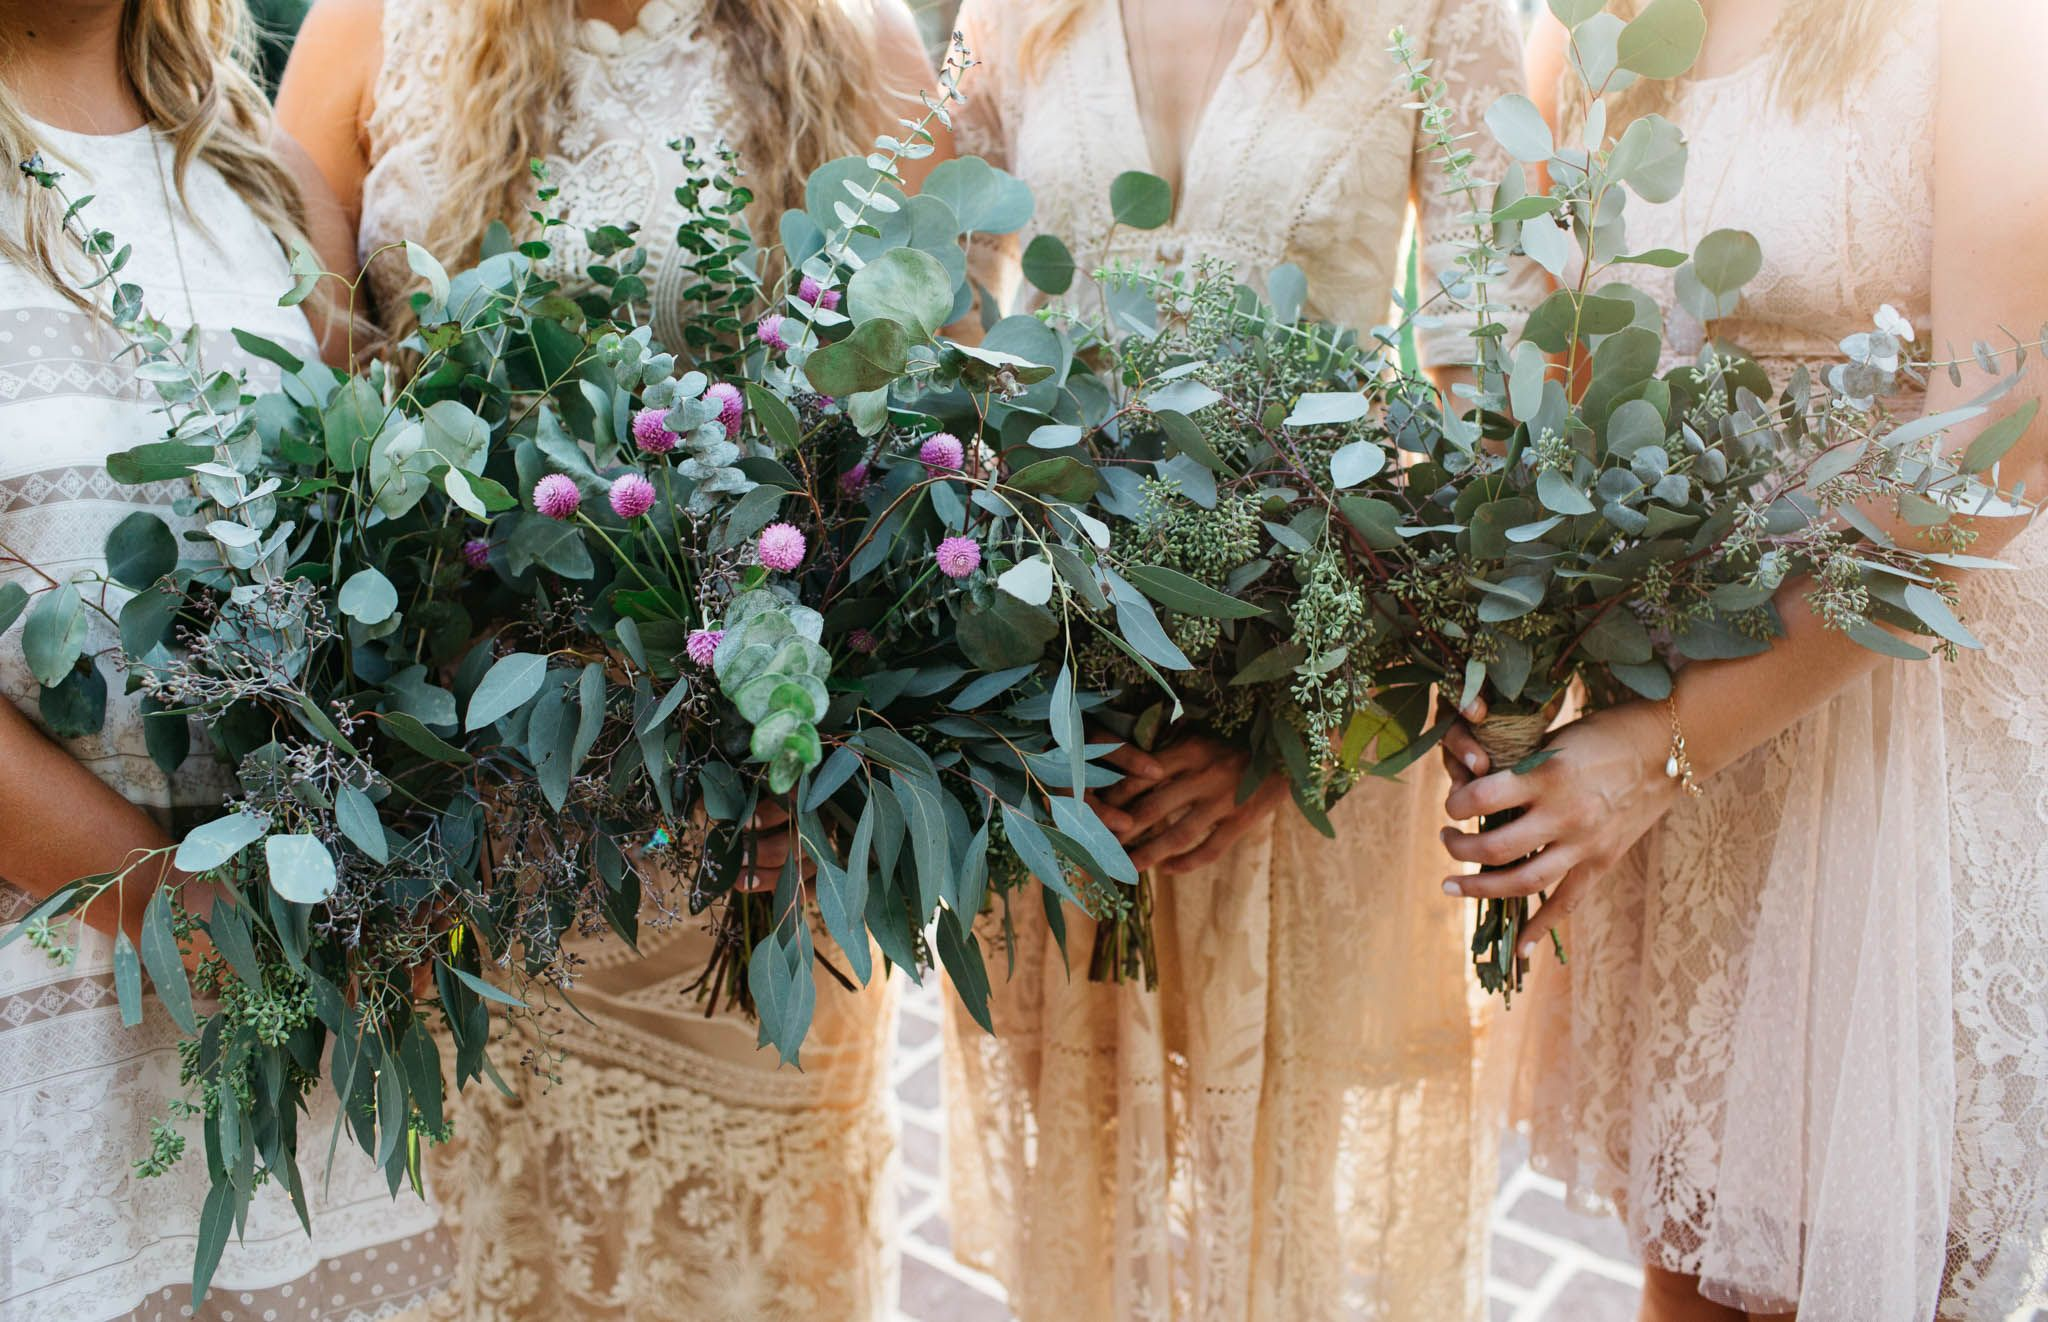 Eucalyptus Bouquets Trader Joes Diy Bouquet Eucalyptus Bouquet Diy Bouquet Eucalyptus Bouquet Diy